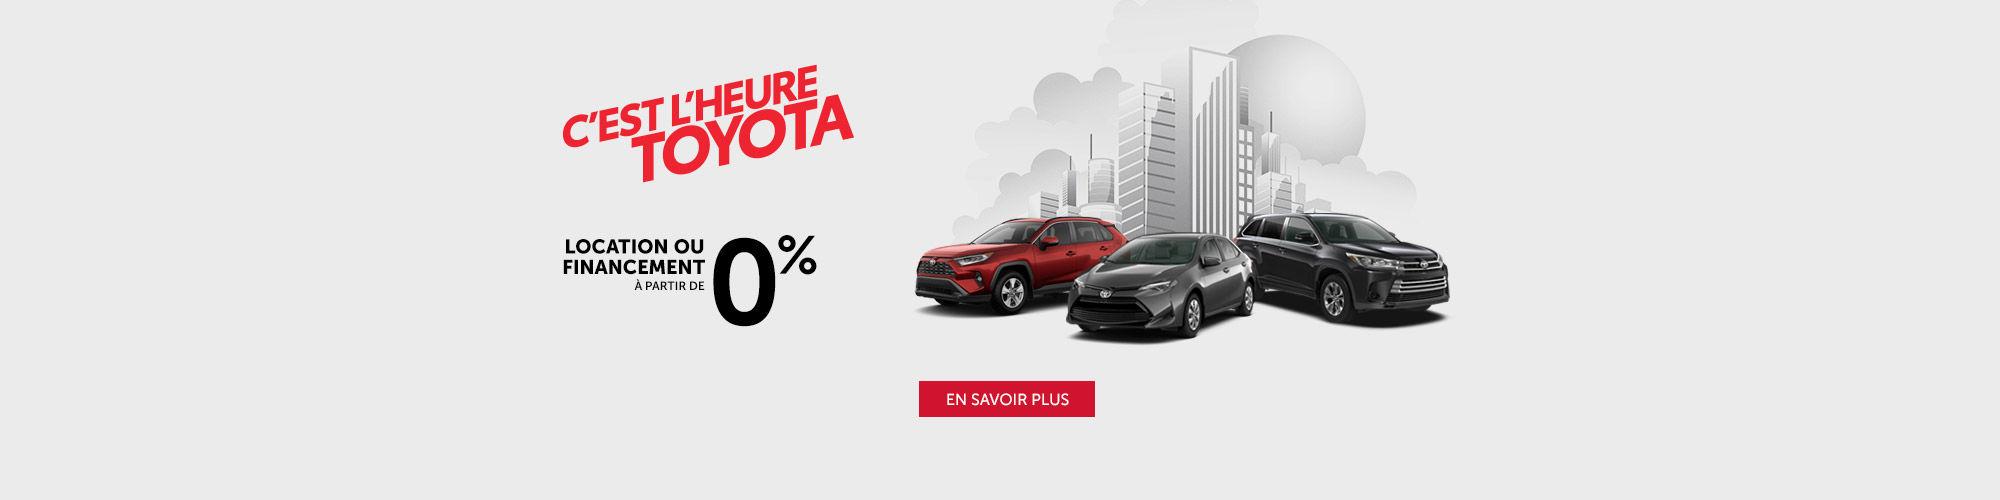 C'est l'heure Toyota